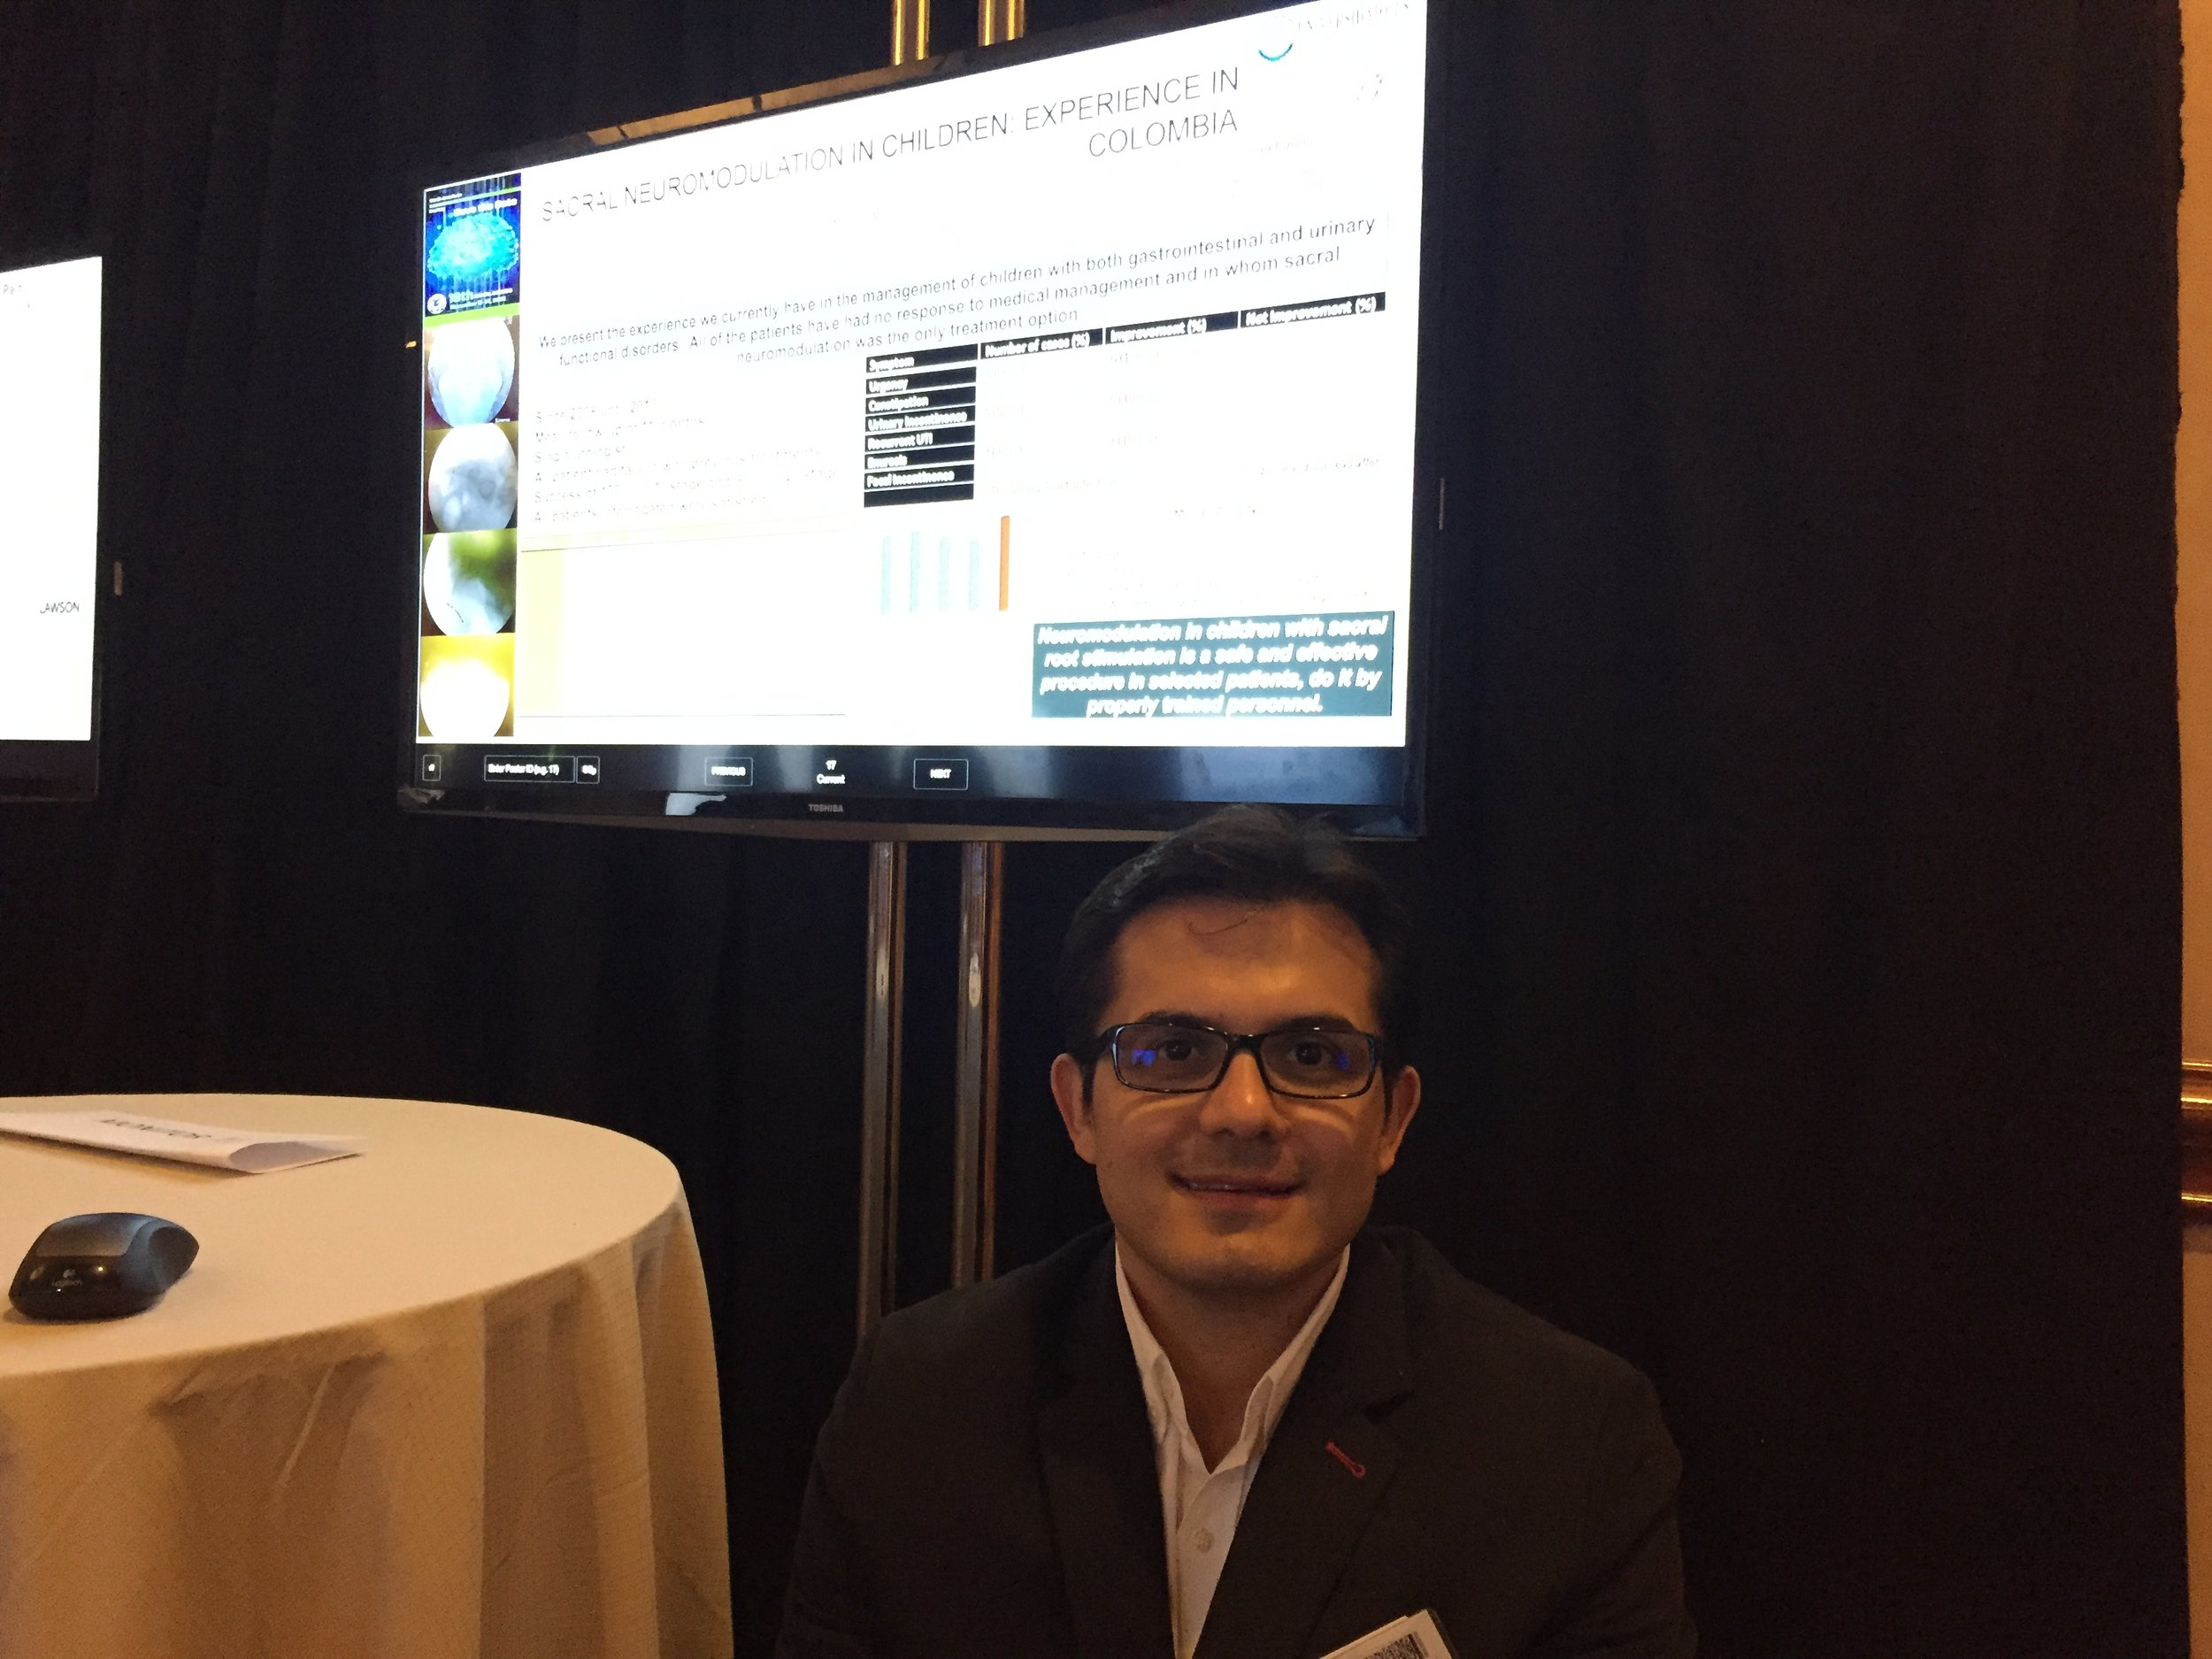 North American Neuromodulation Society annual meeting. Las Vegas, EEUU. December 2014